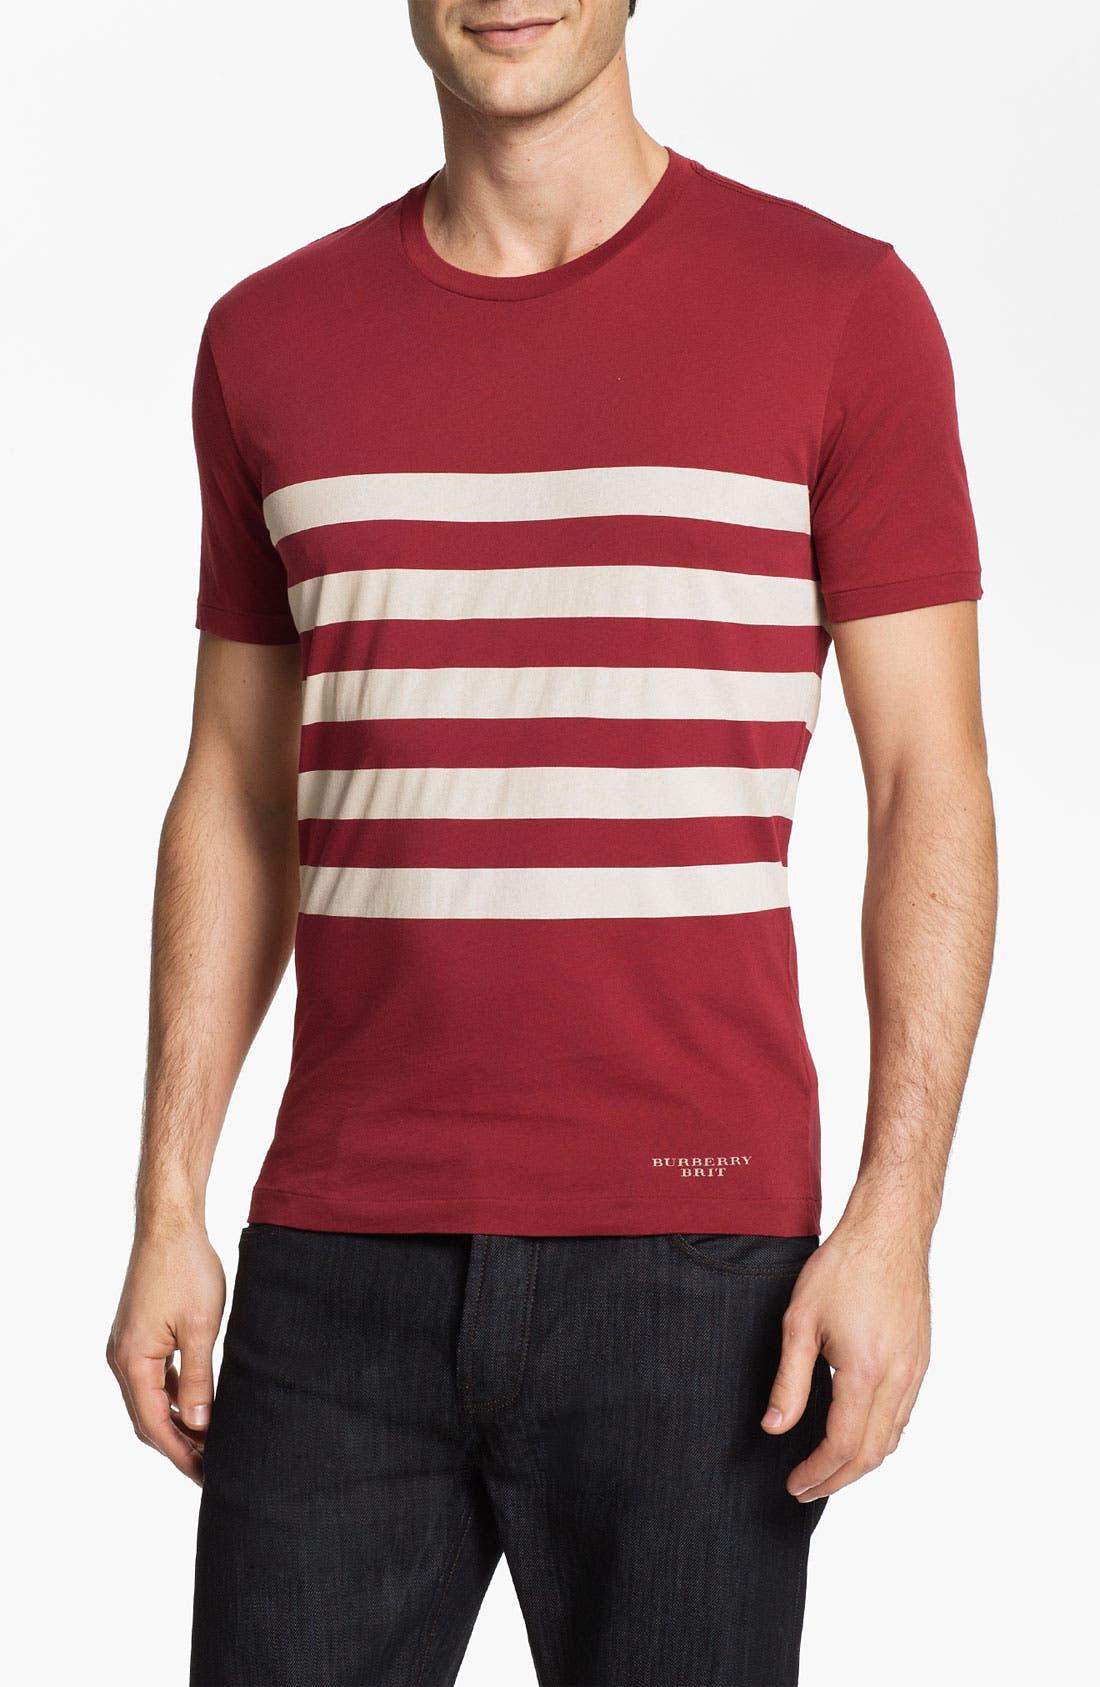 Main Image - Burberry Brit 'Piper' T-Shirt